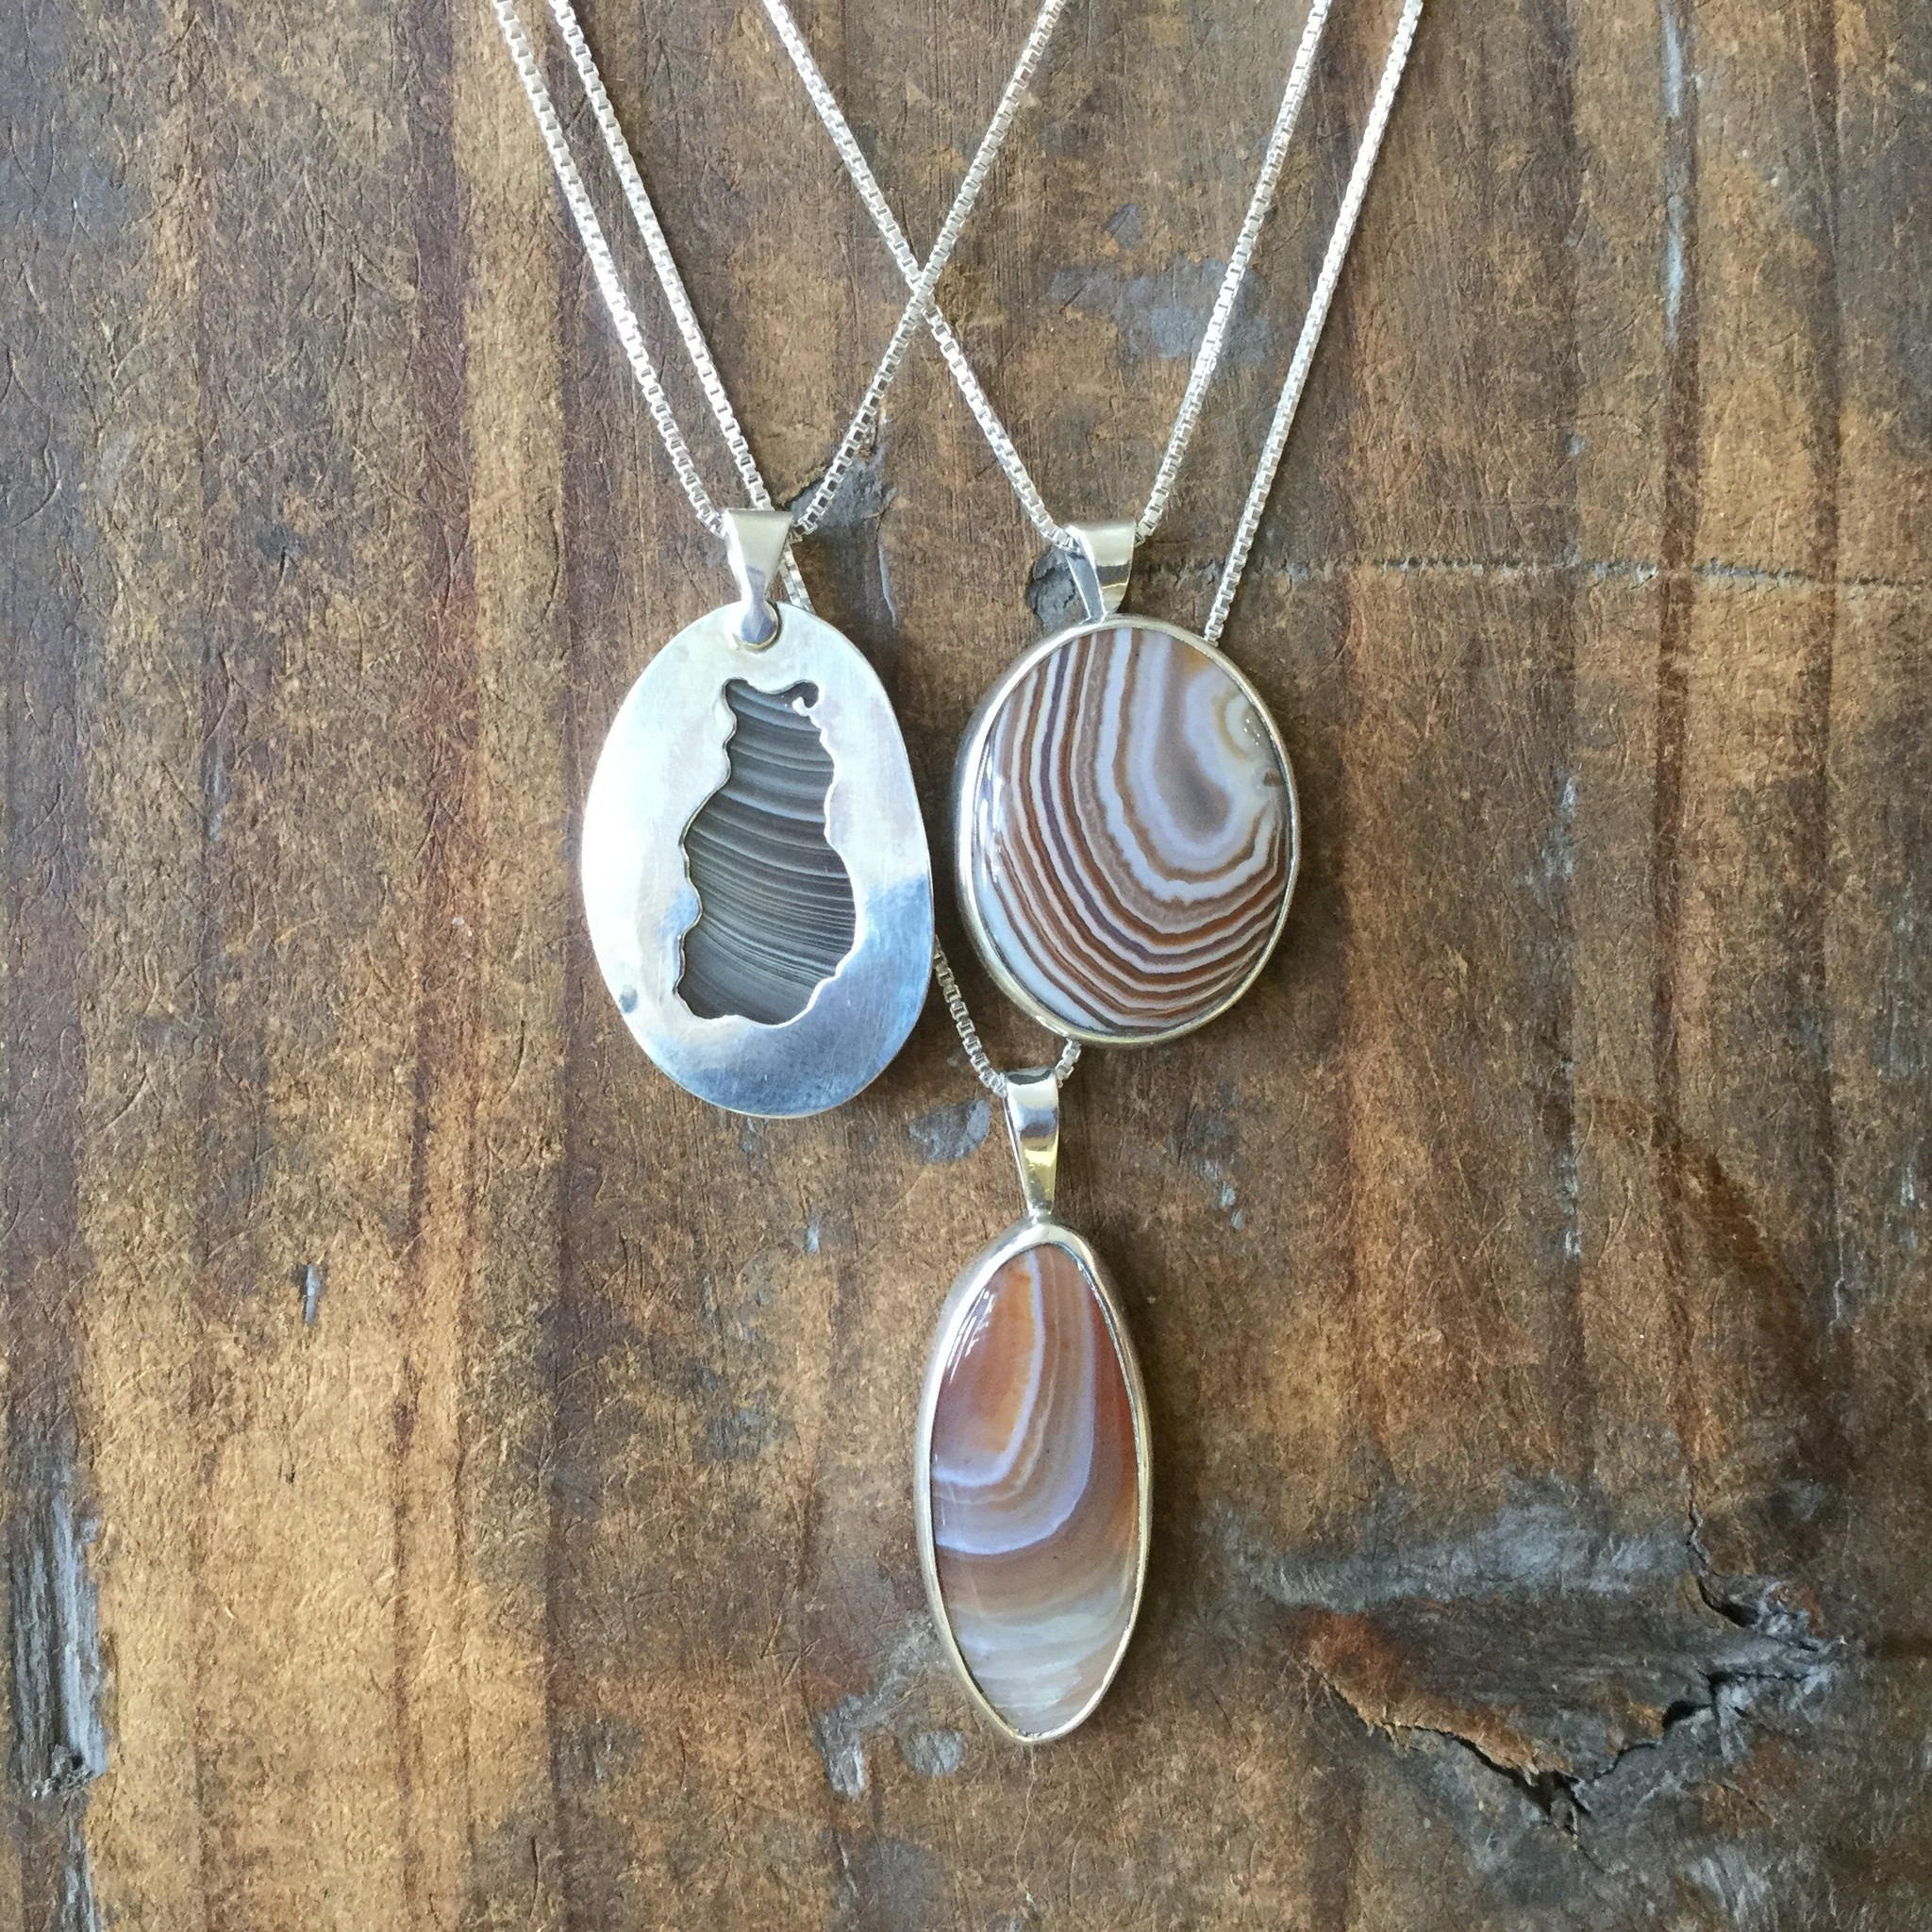 Lake Superior Agate Necklaces